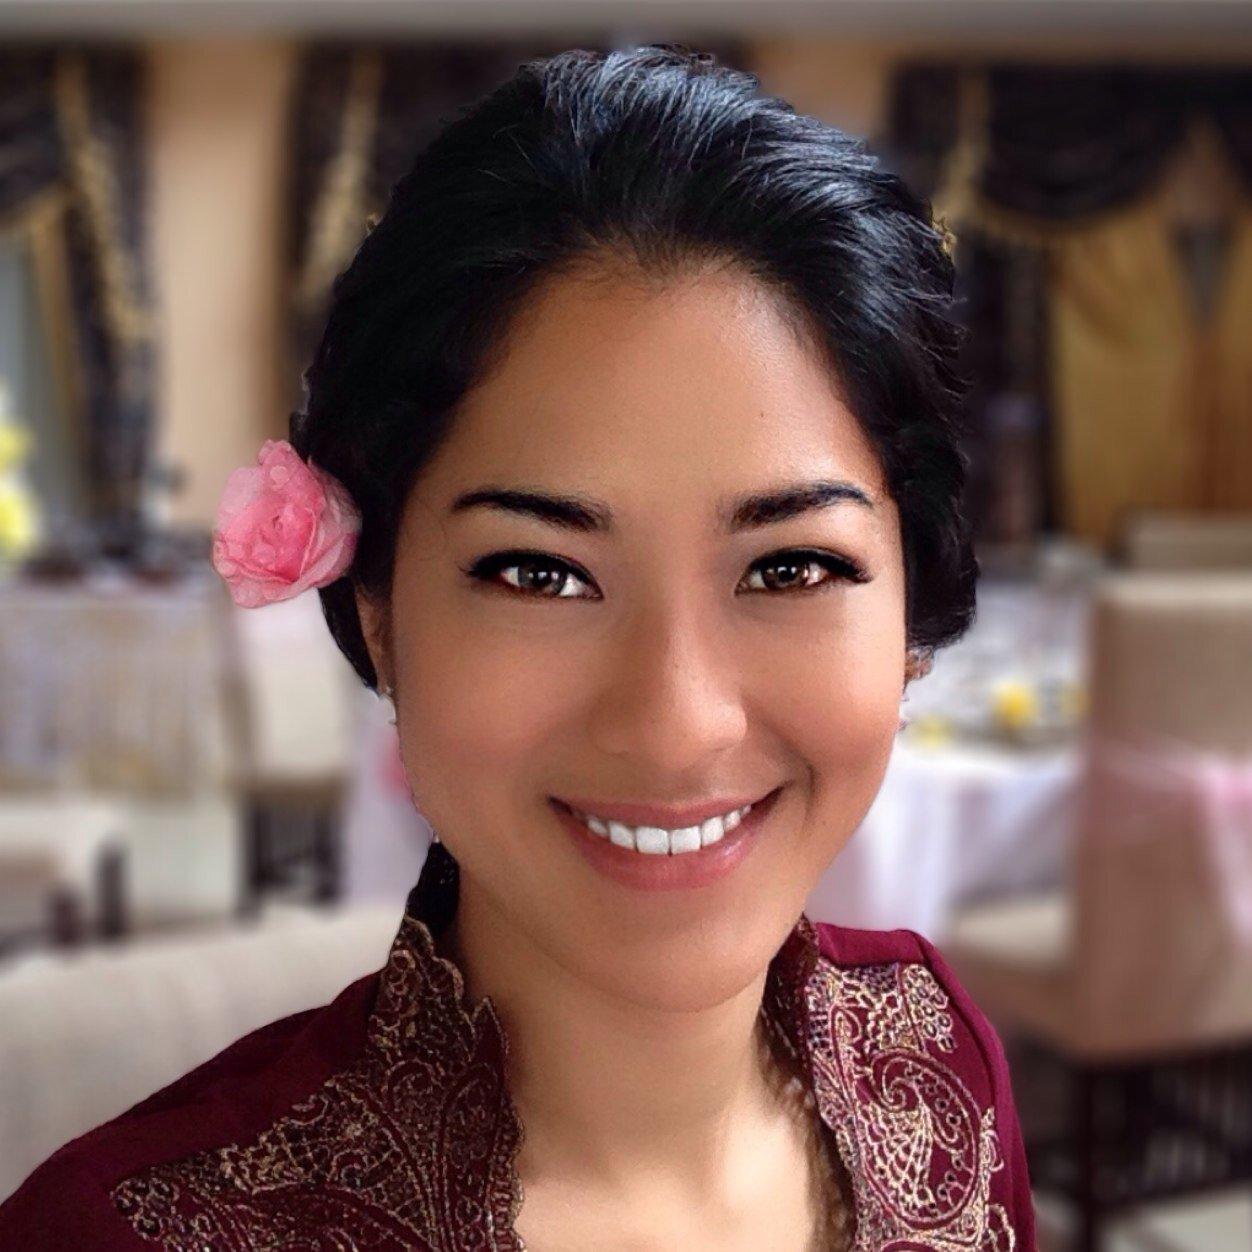 Prisia Nasution nude photos 2019